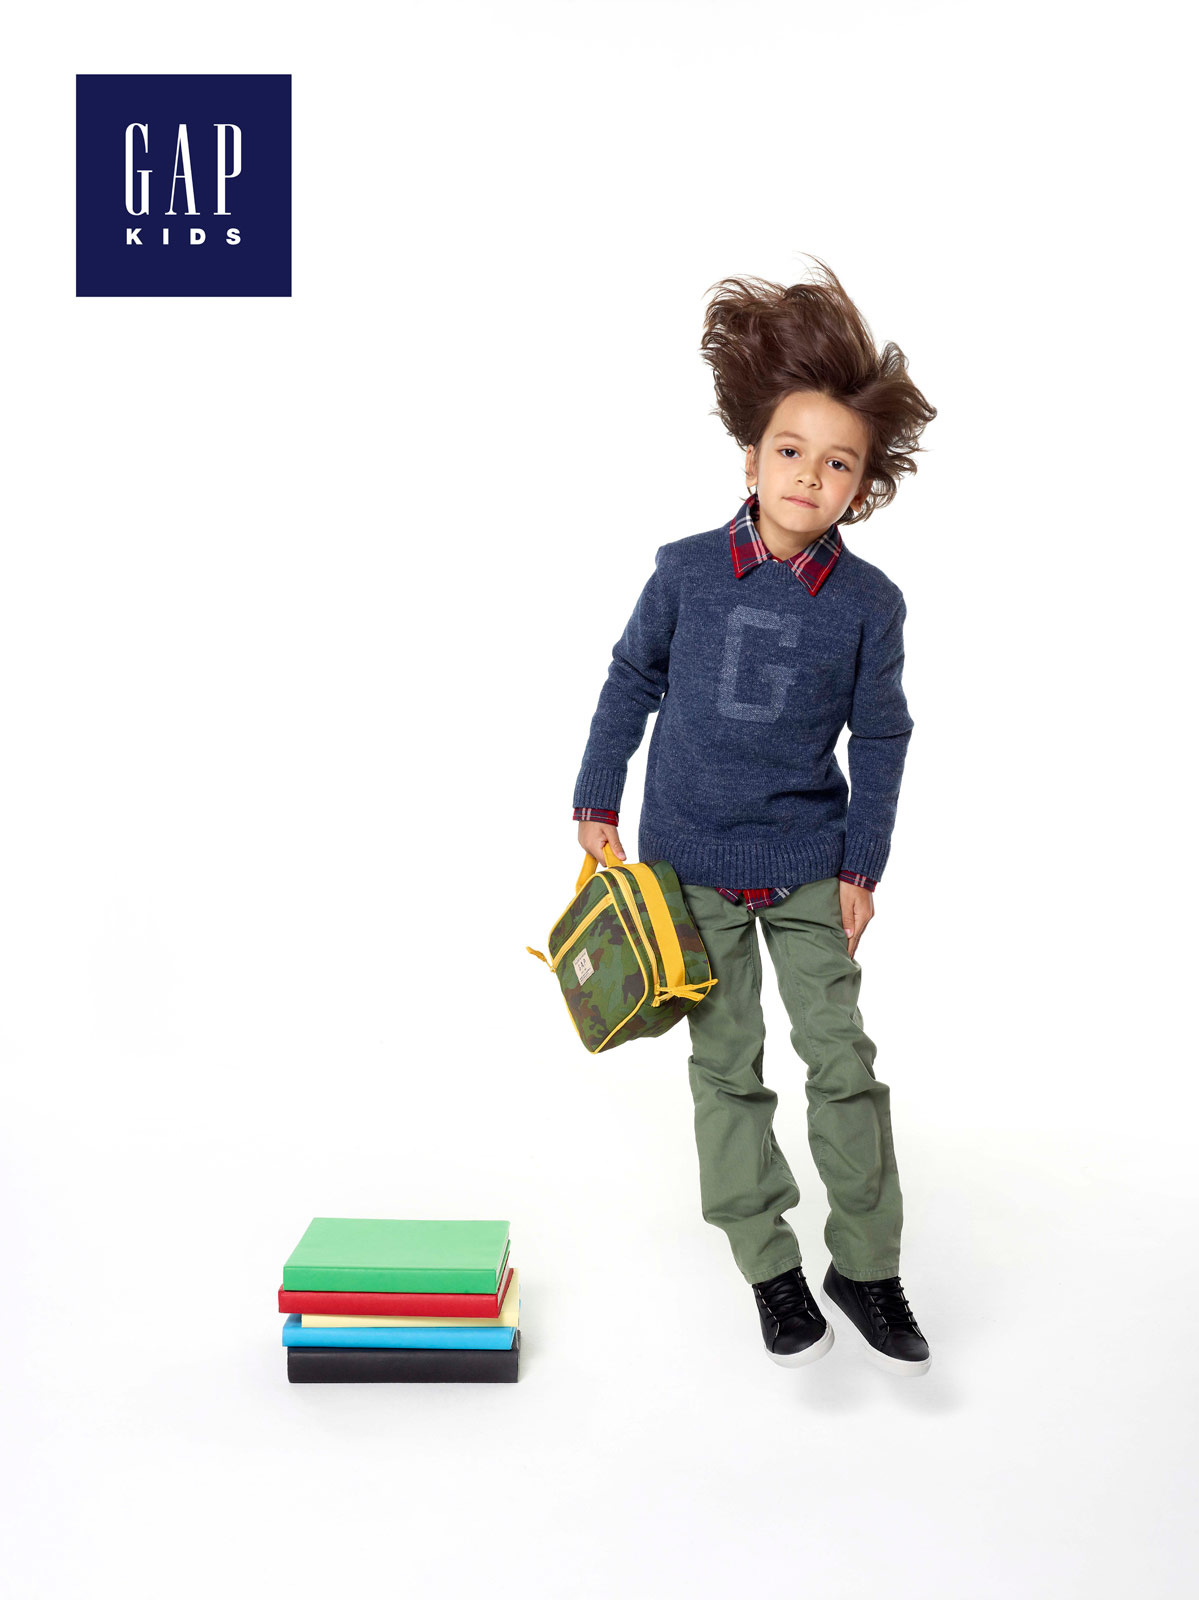 20141018--Gap-Kids-60625-(with-logo)---Mark-2-copy.jpg